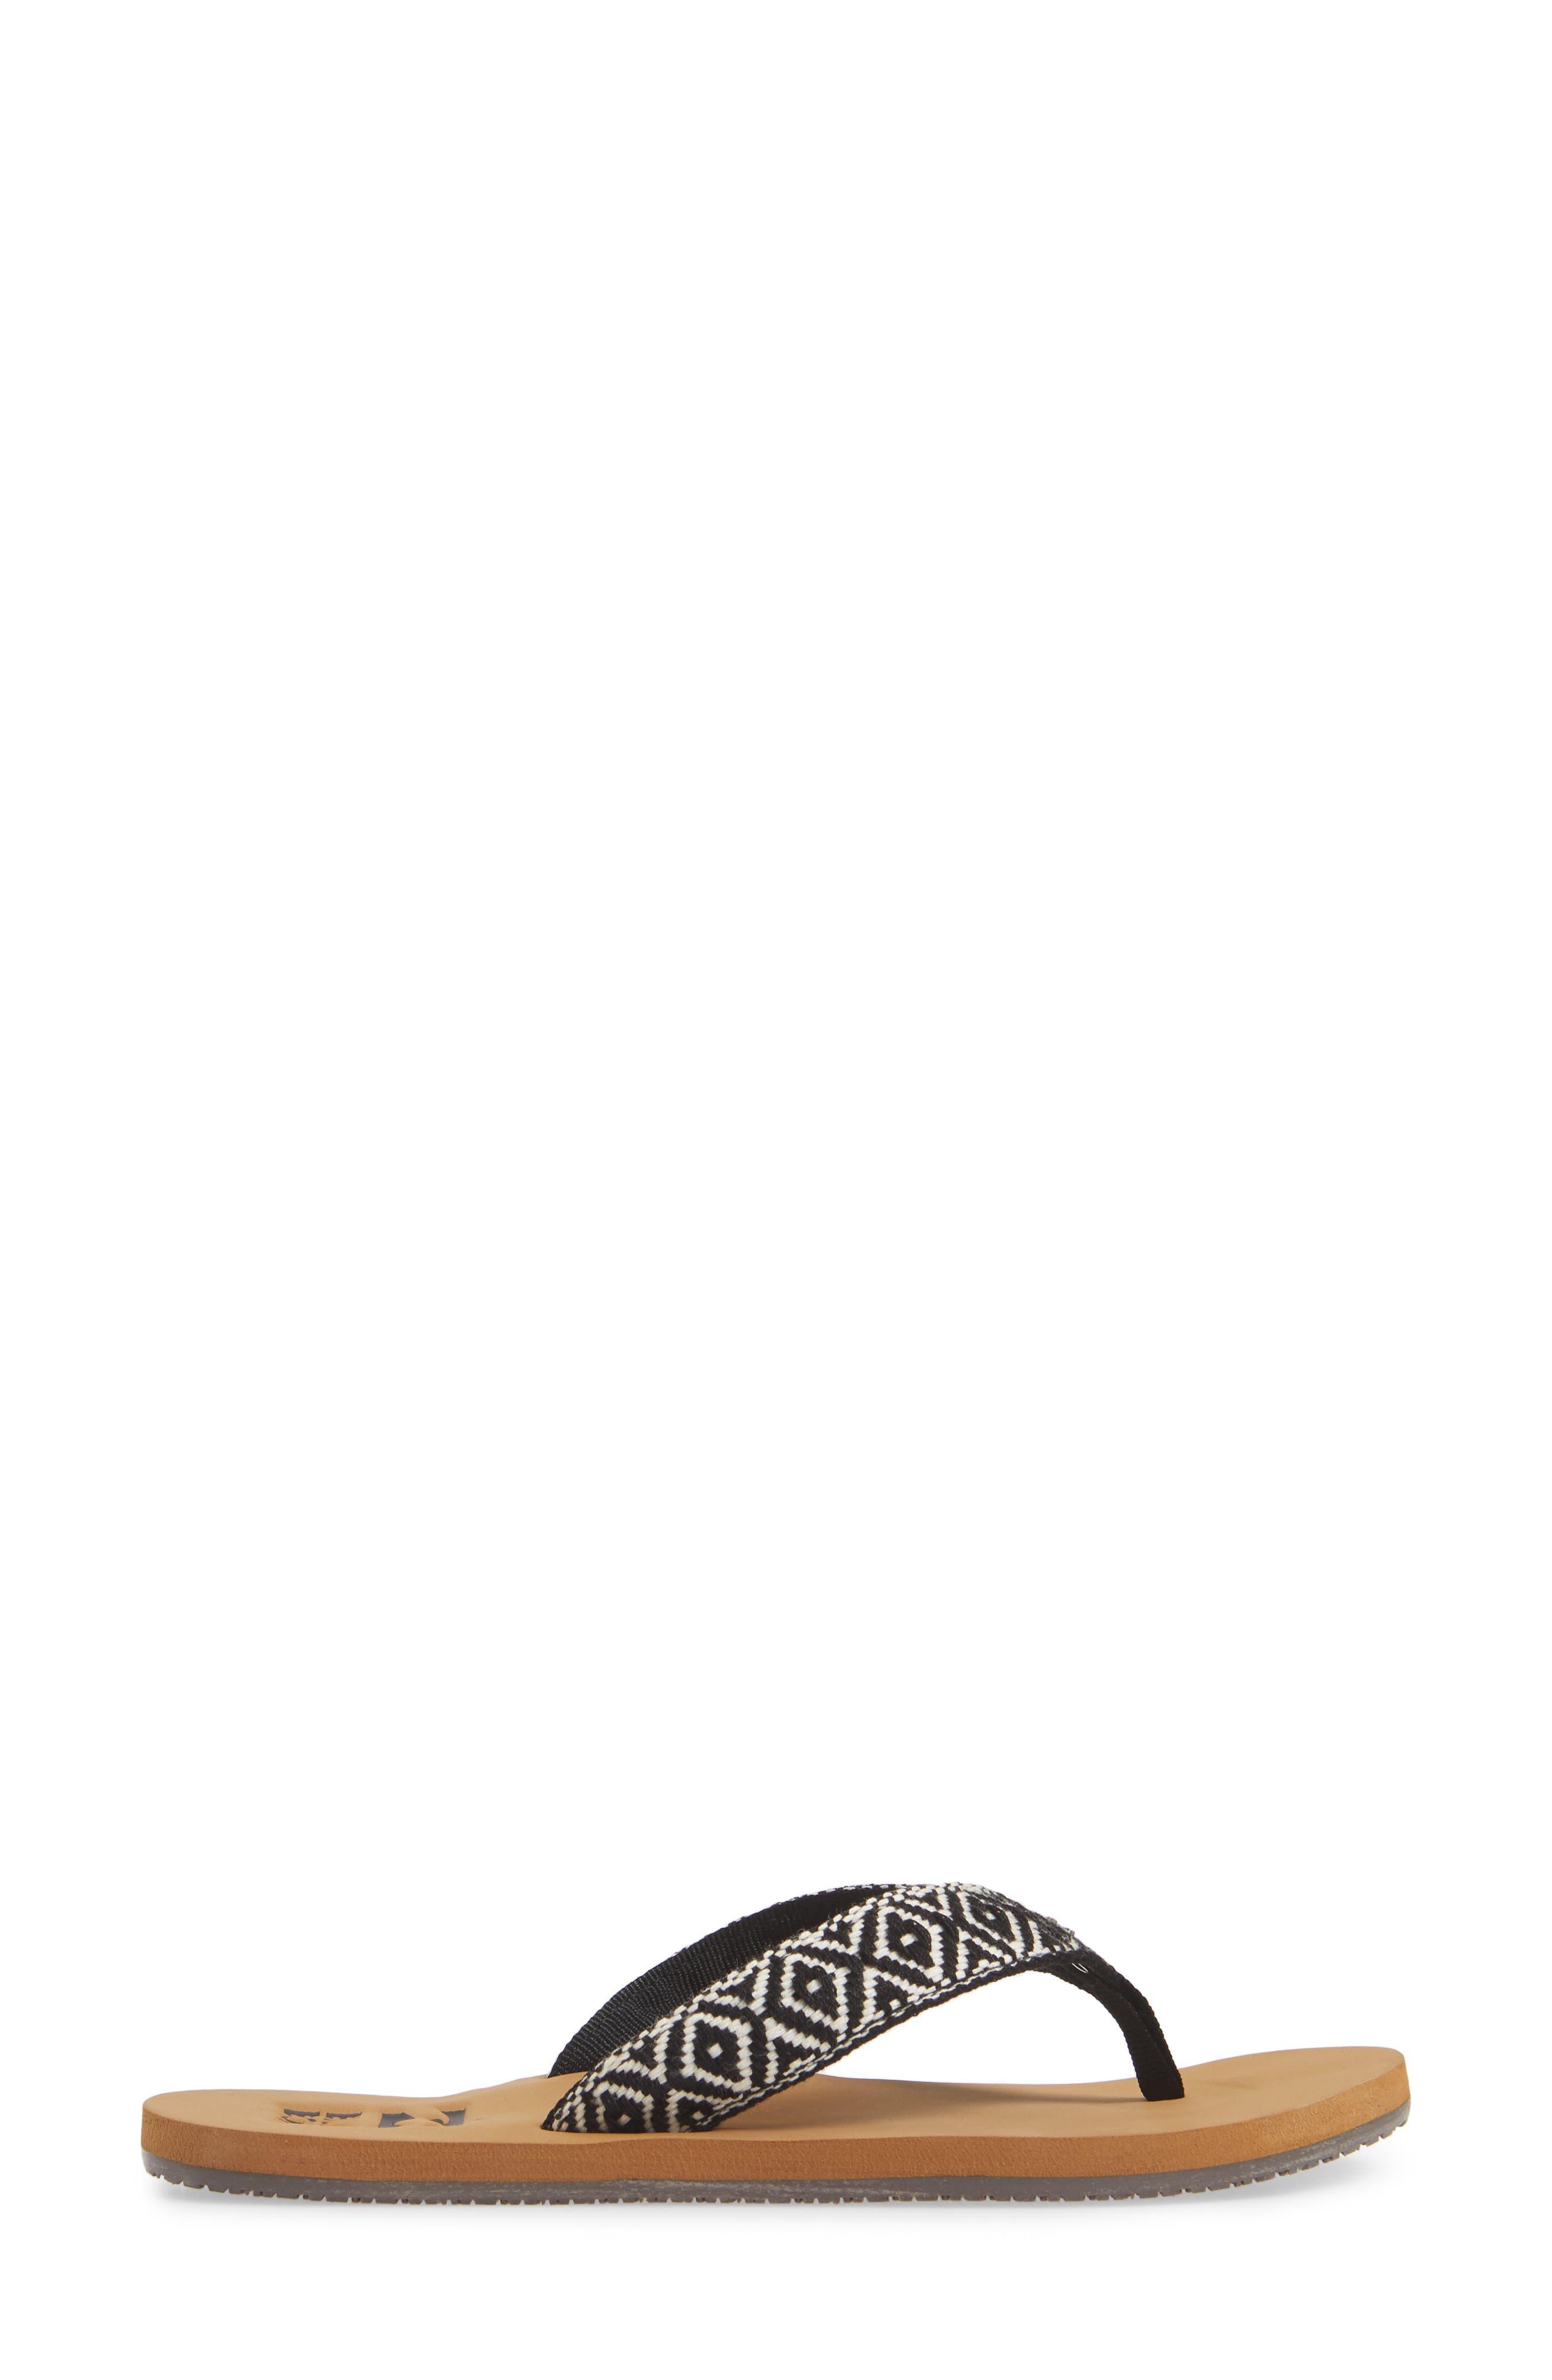 Baja Flip Flop,                             Alternate thumbnail 3, color,                             BLACK/ WHITE